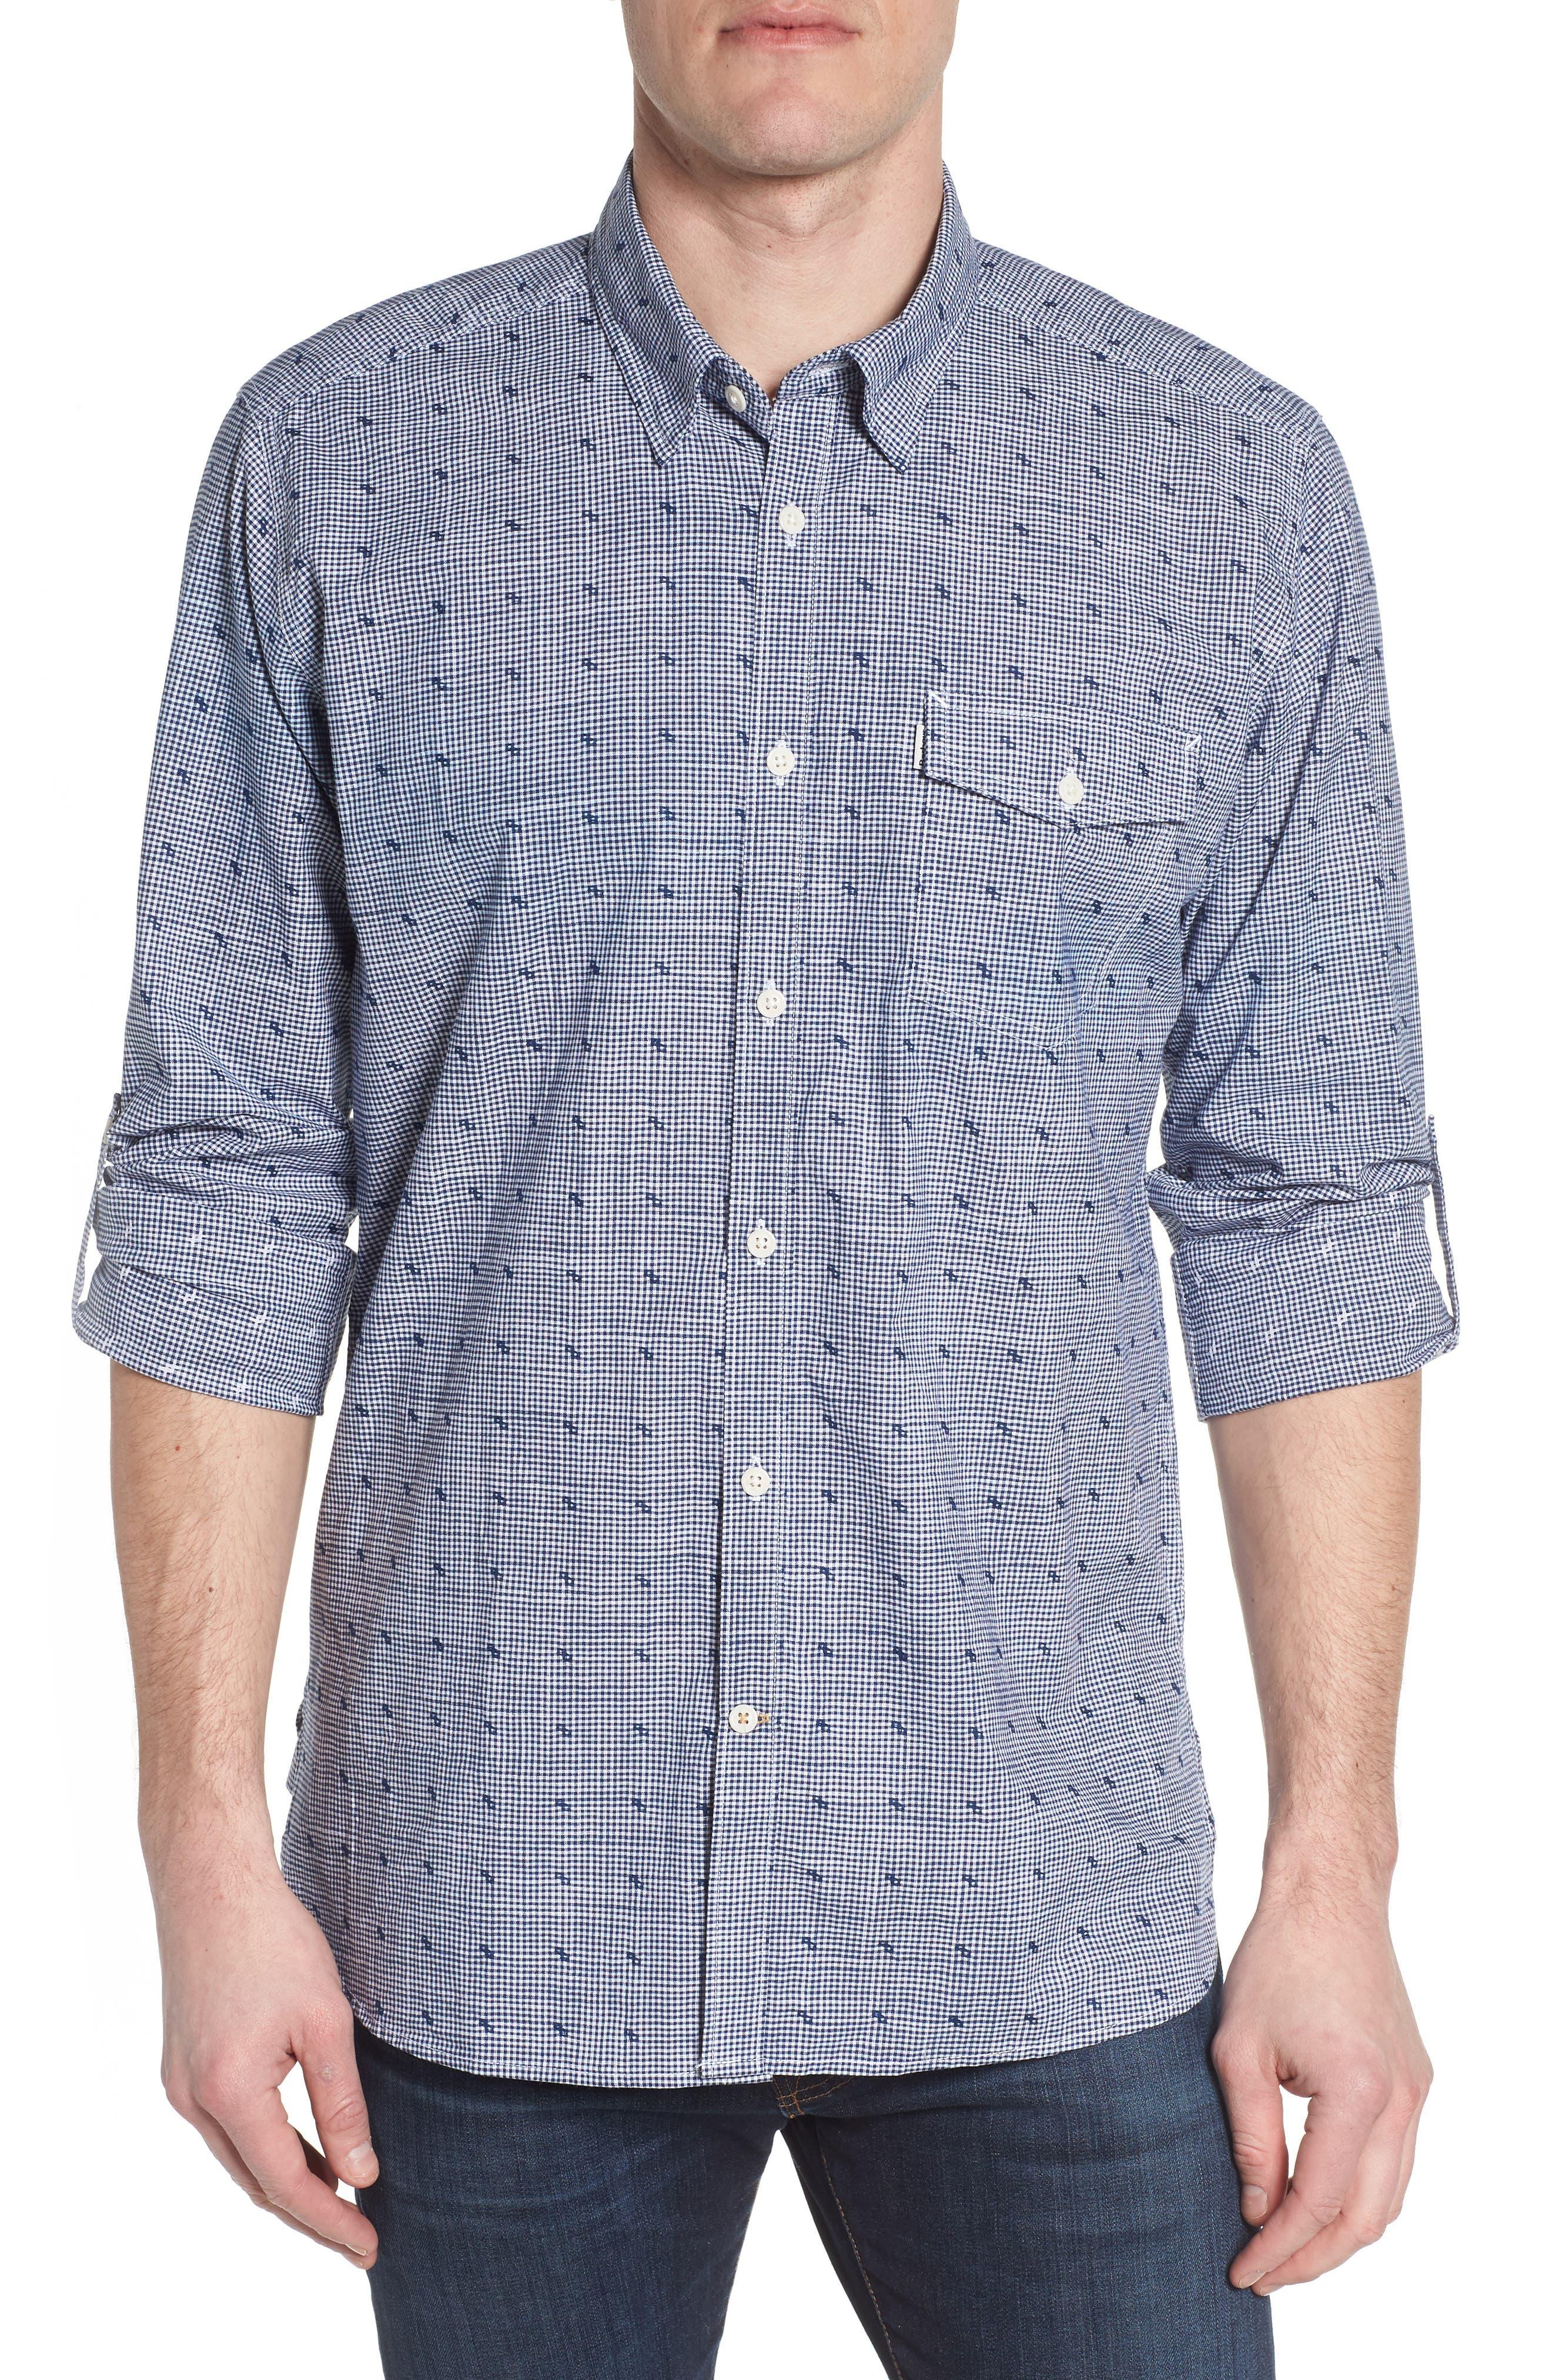 Beluga Regular Fit Check Sport Shirt,                             Main thumbnail 1, color,                             410